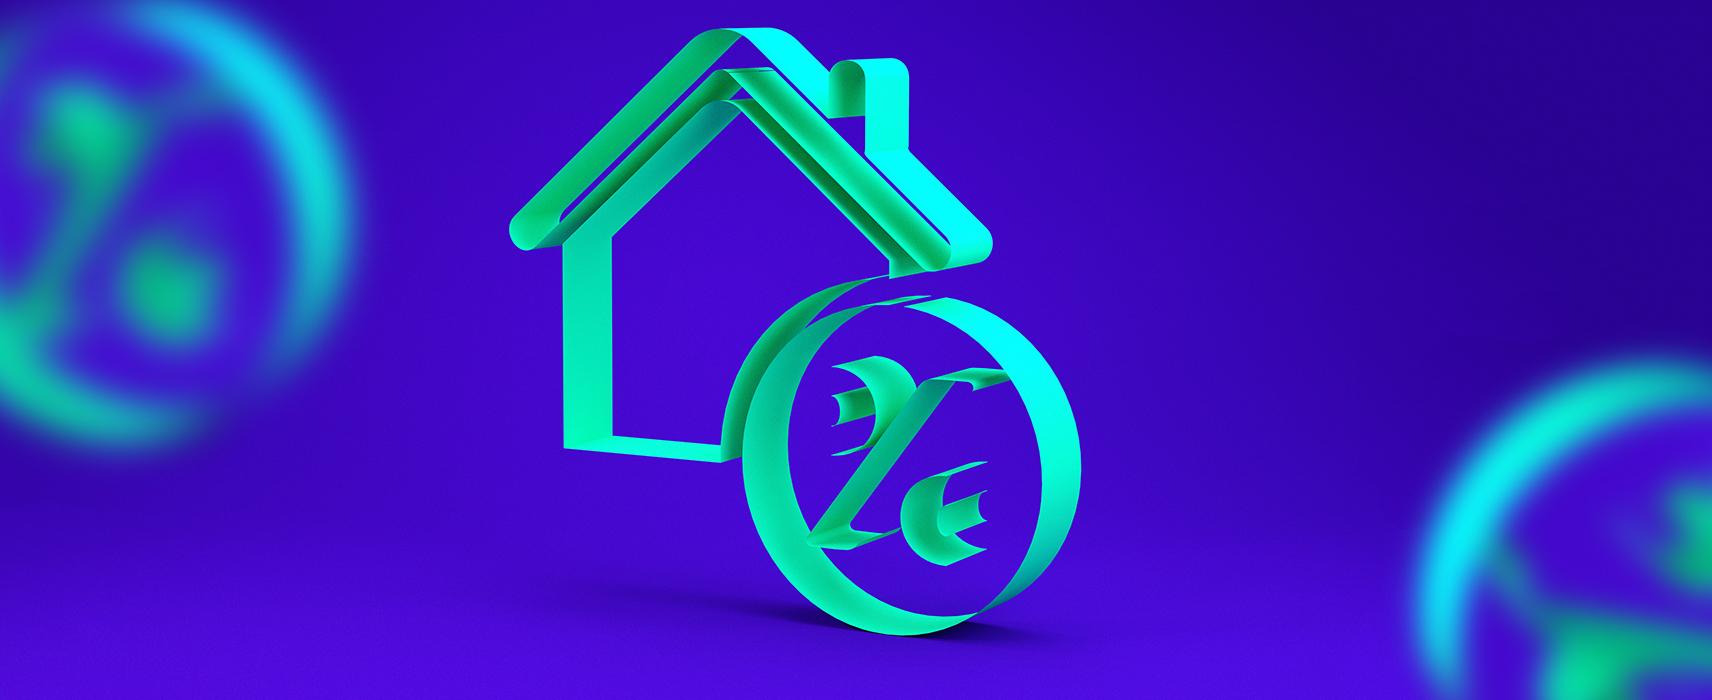 #пофиншую: не слишком ли много вы платите за ипотеку?